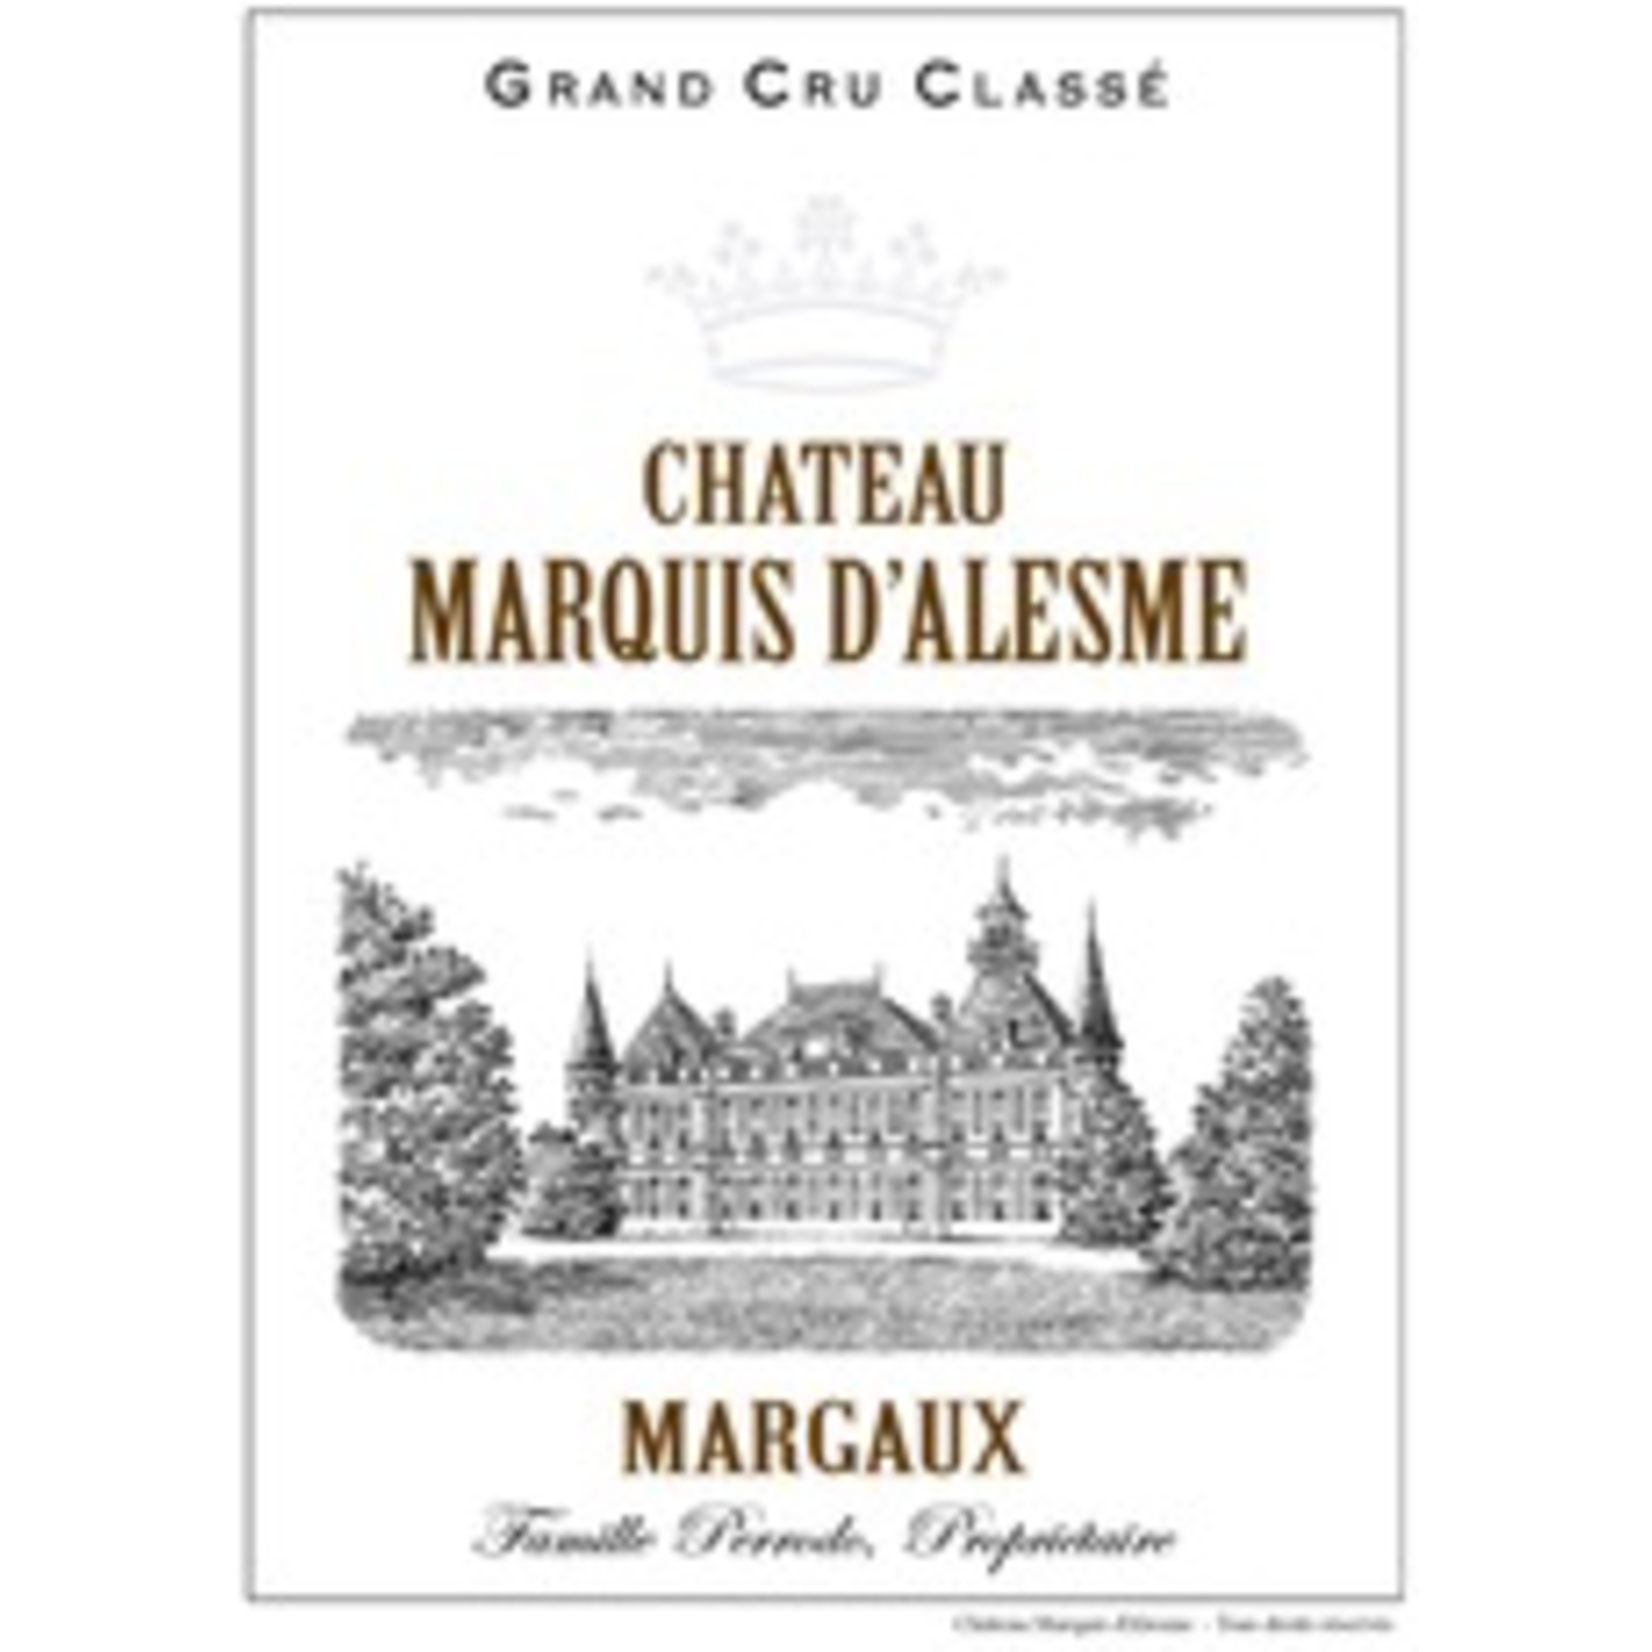 Wine Ch Marquis d'Alesme Becker 2018